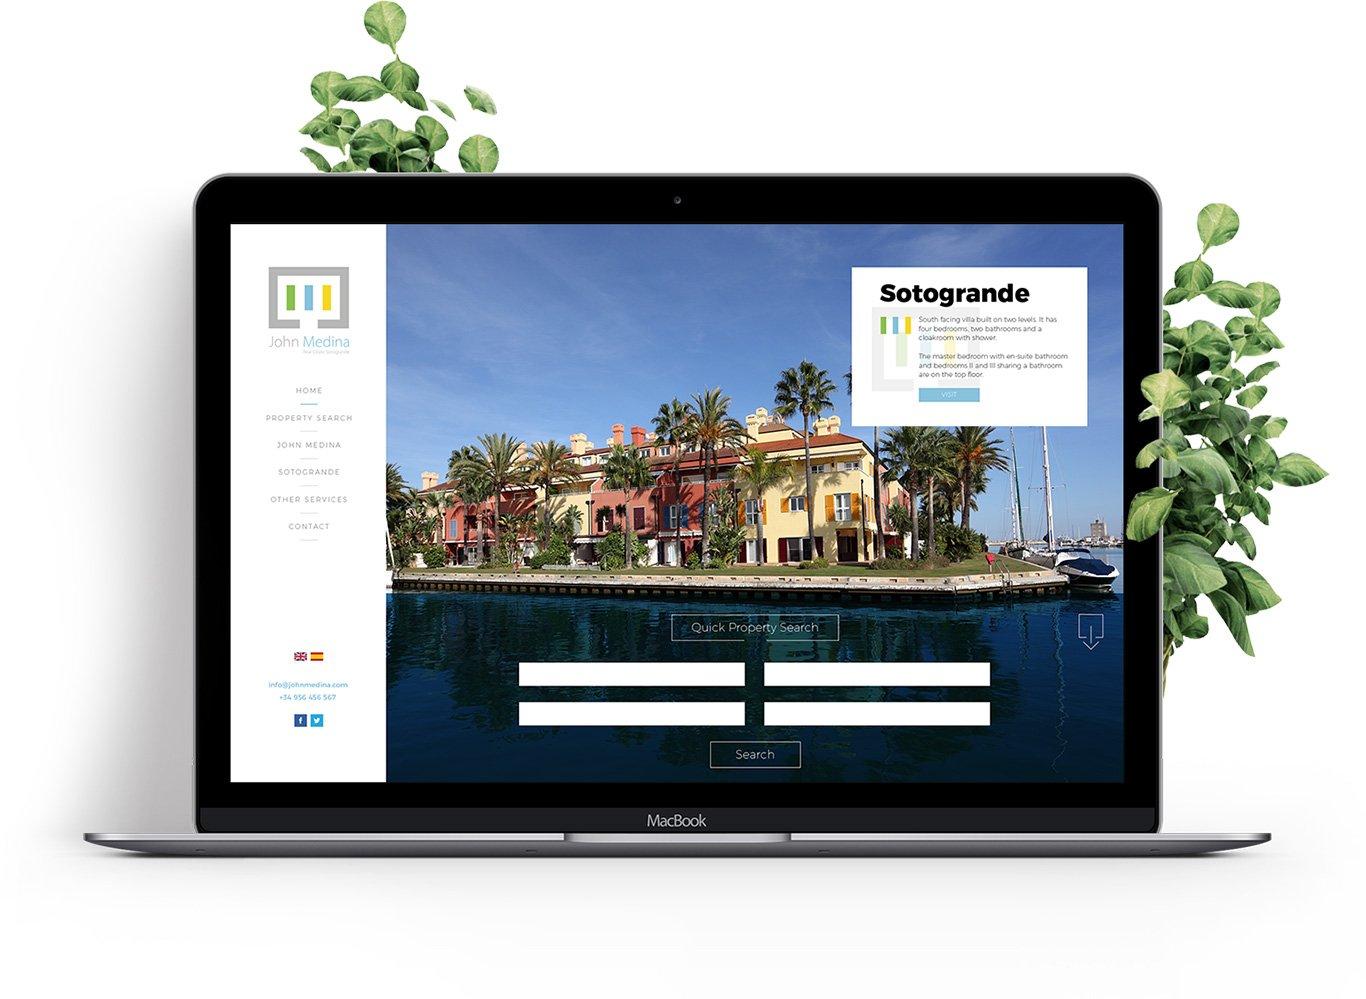 diseño-web-john-medina-agencia-adhoc-5